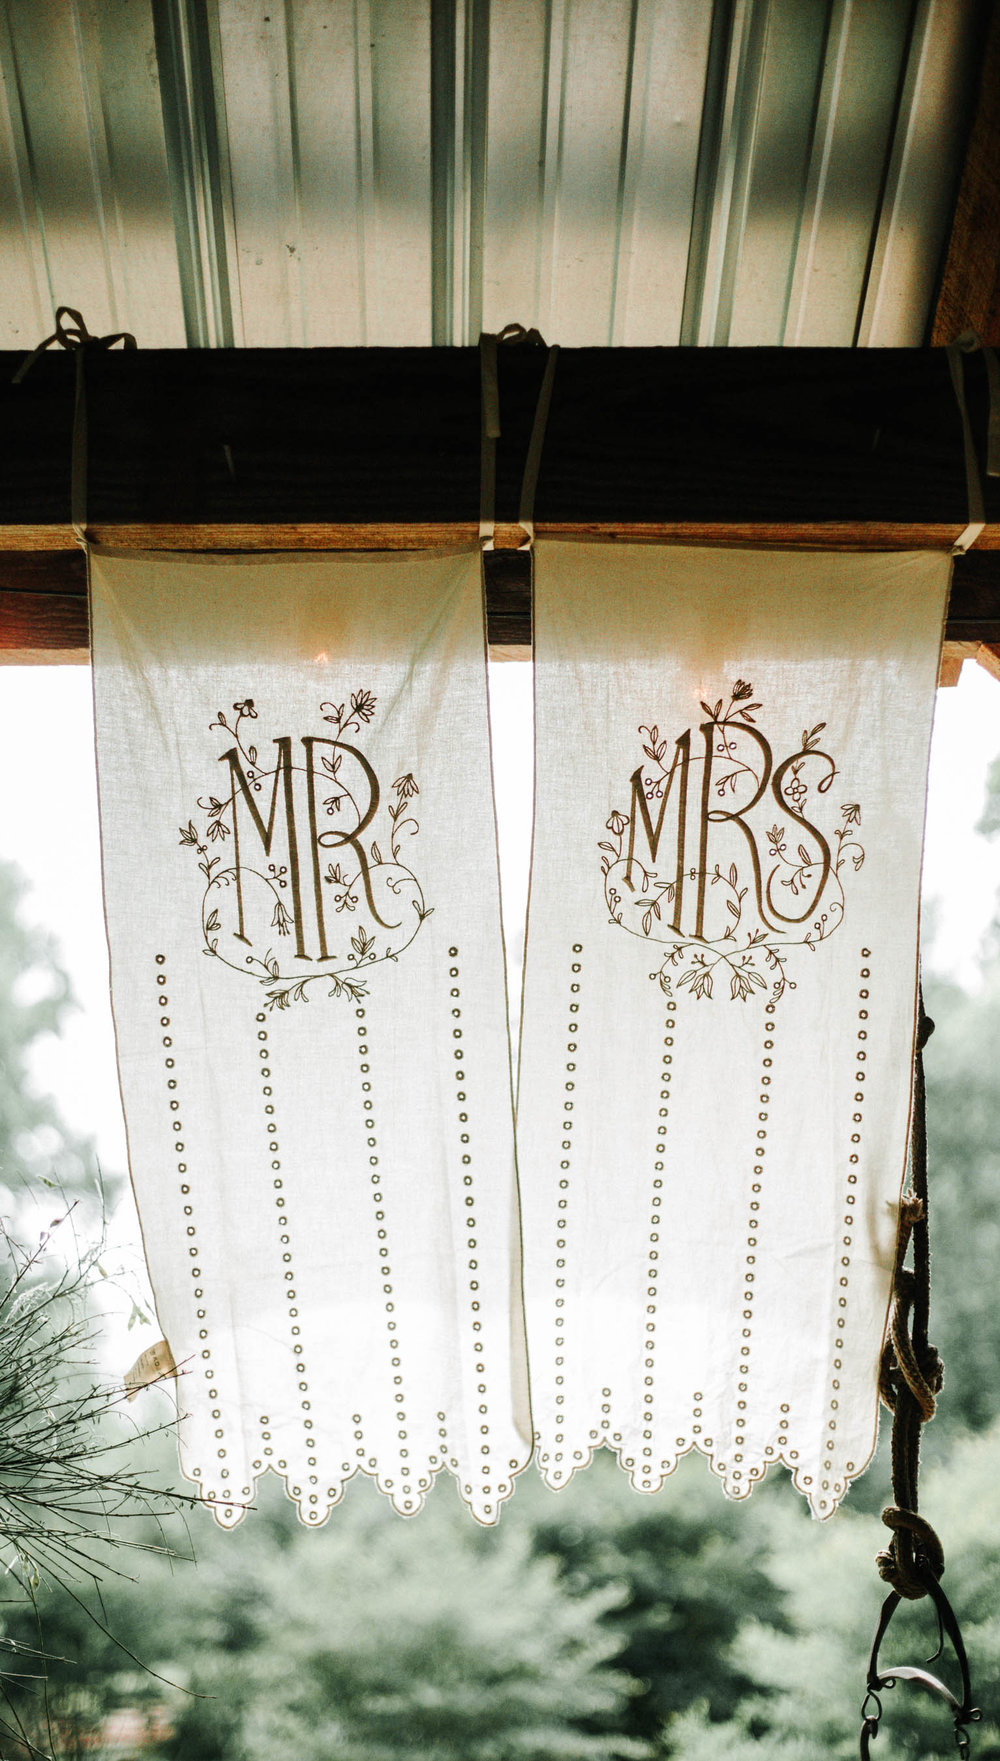 Neverland-2-2.jpg